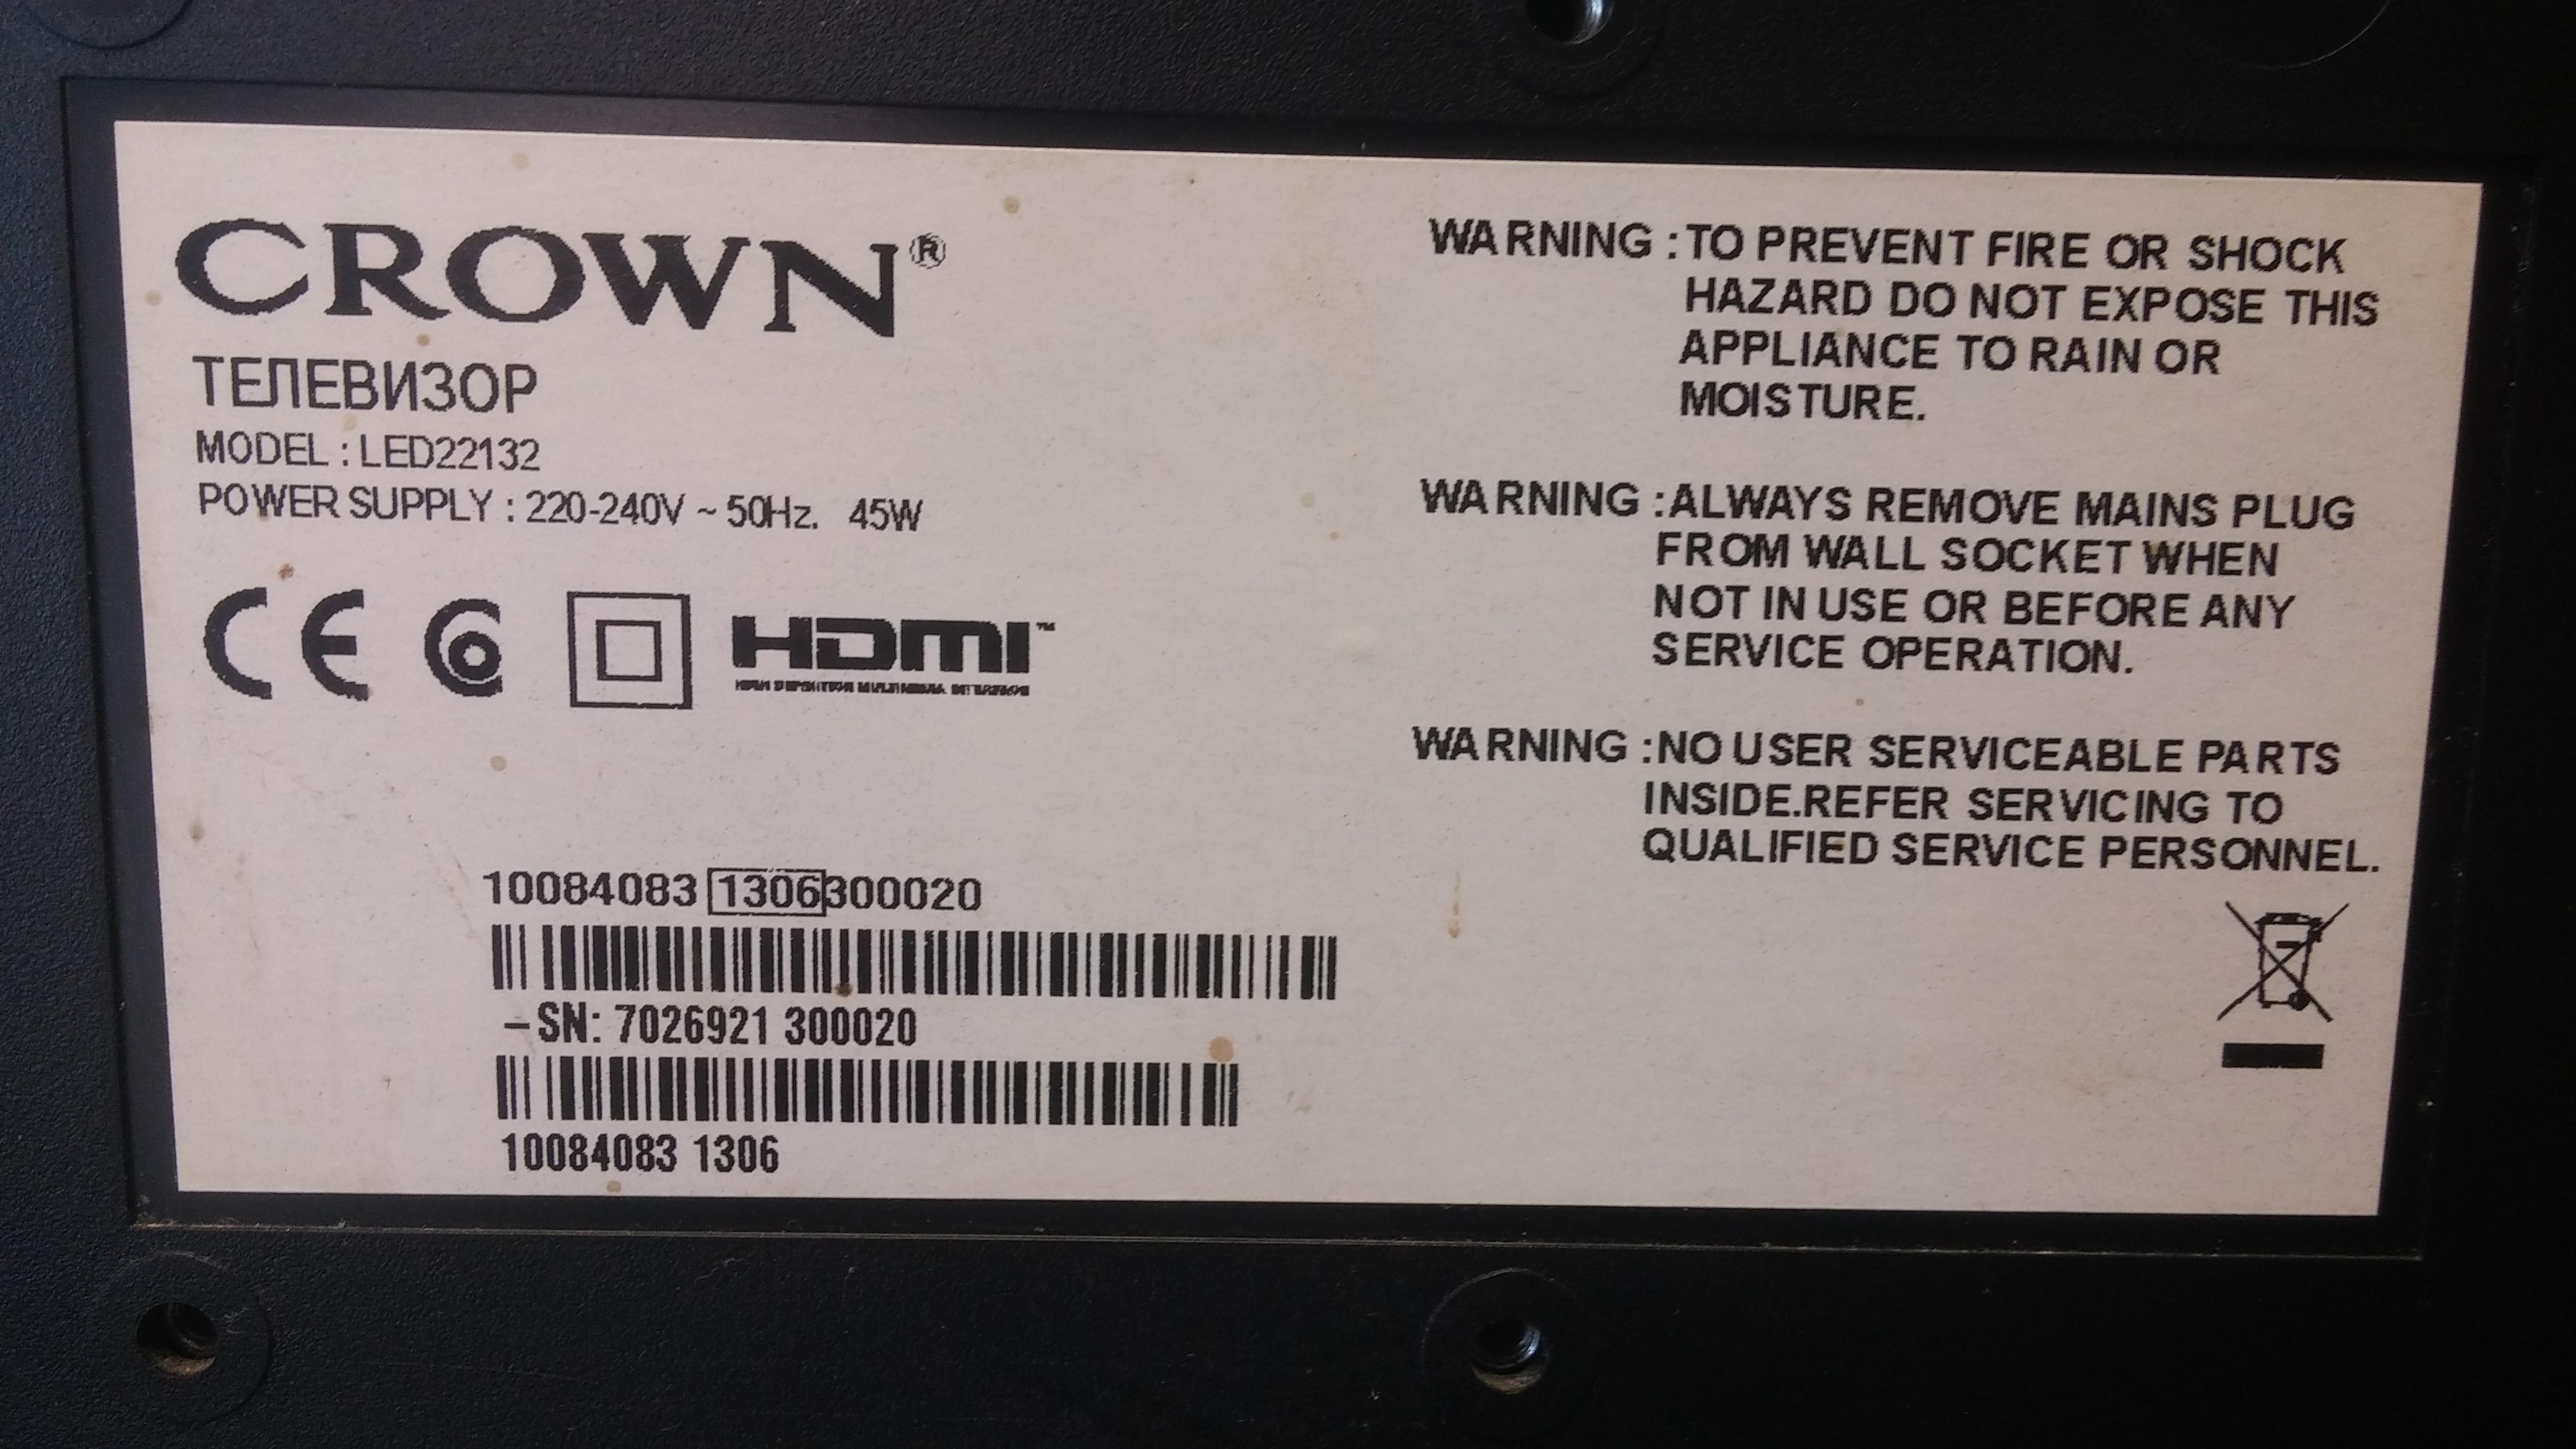 Crown LED22132 - 17MB82-1a - CiklonElectro